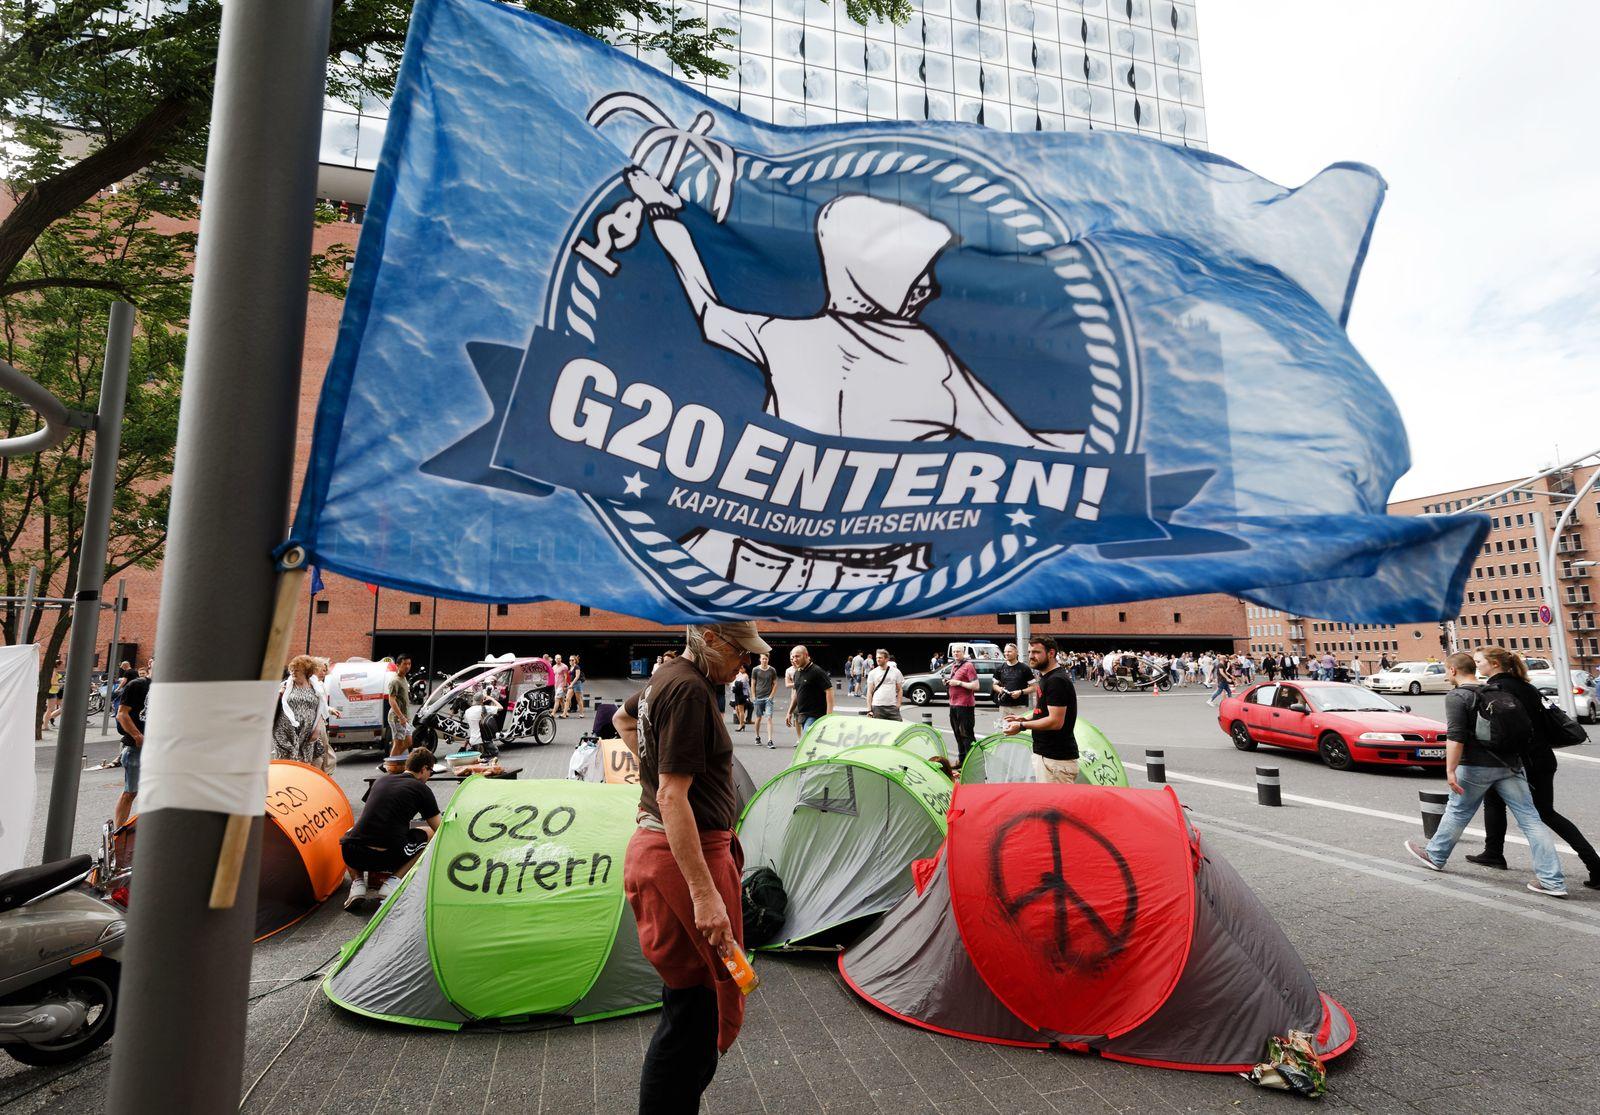 G20 Protestplakate